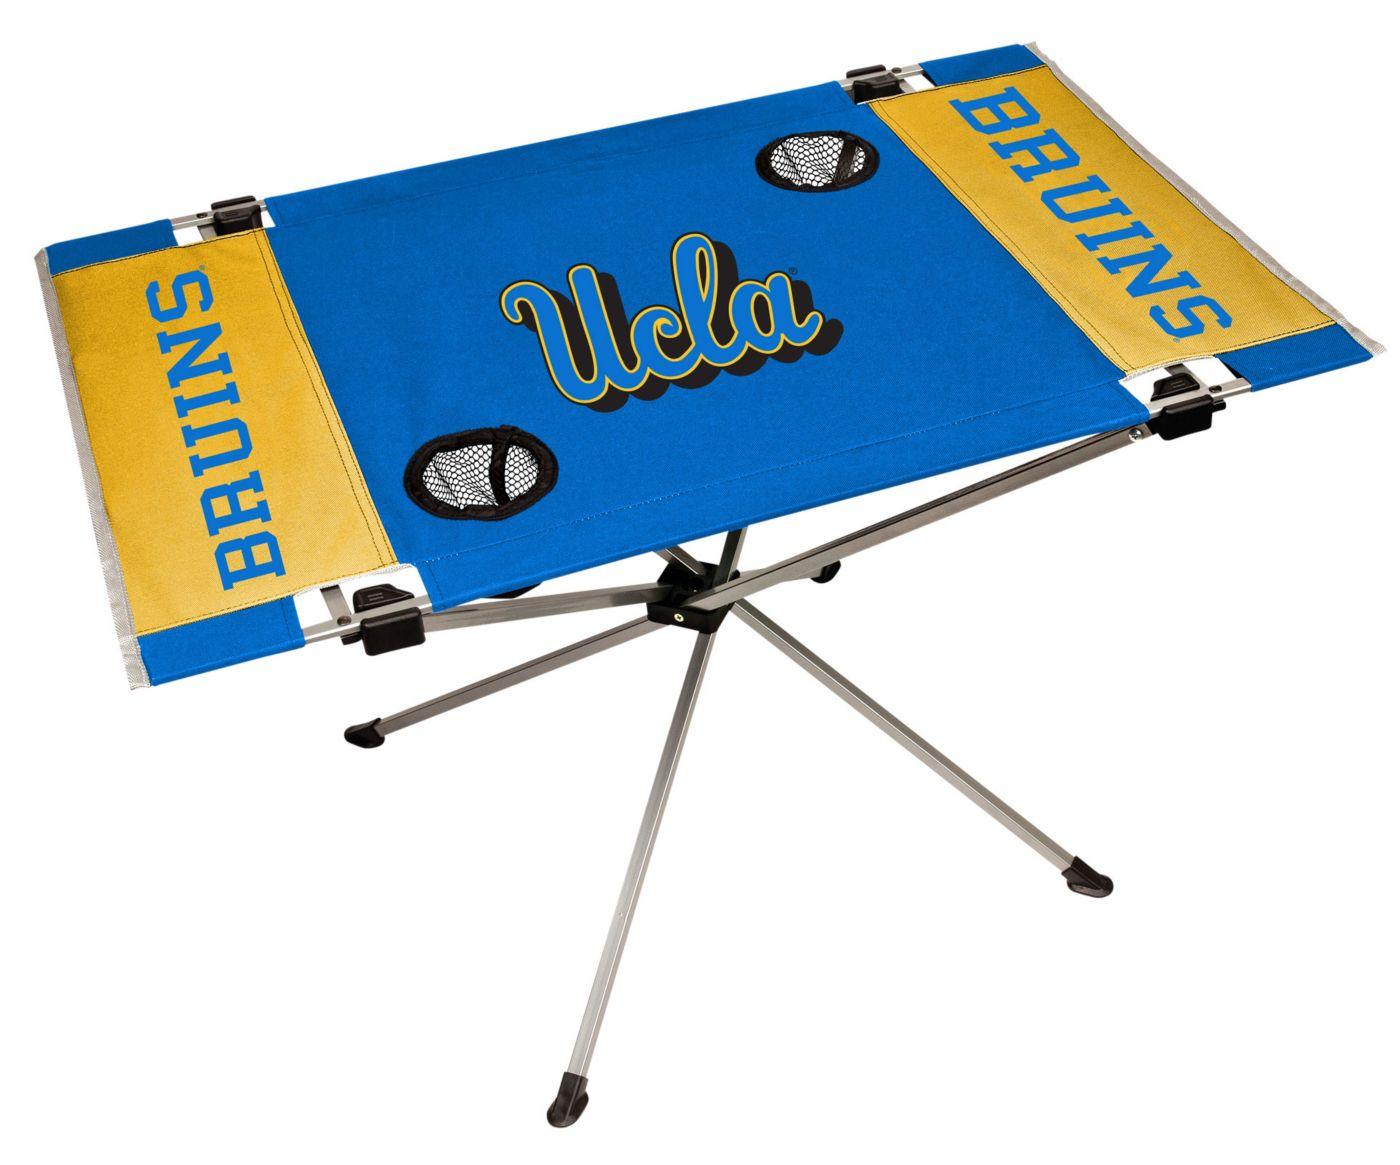 Rawlings UCLA Bruins Endzone Table